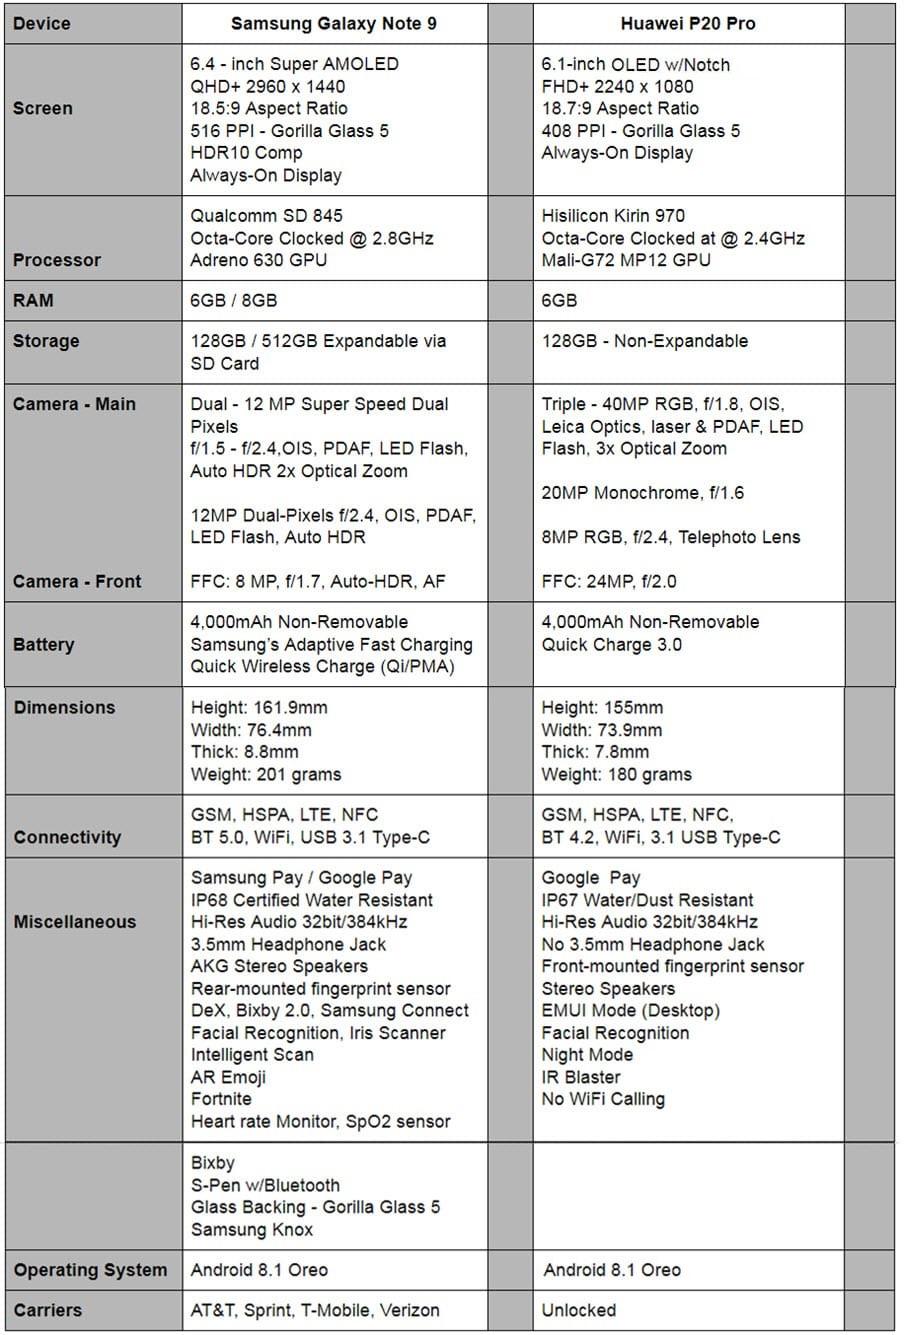 Phone Comparisons: Samsung Galaxy Note 9 vs Huawei P20 Pro